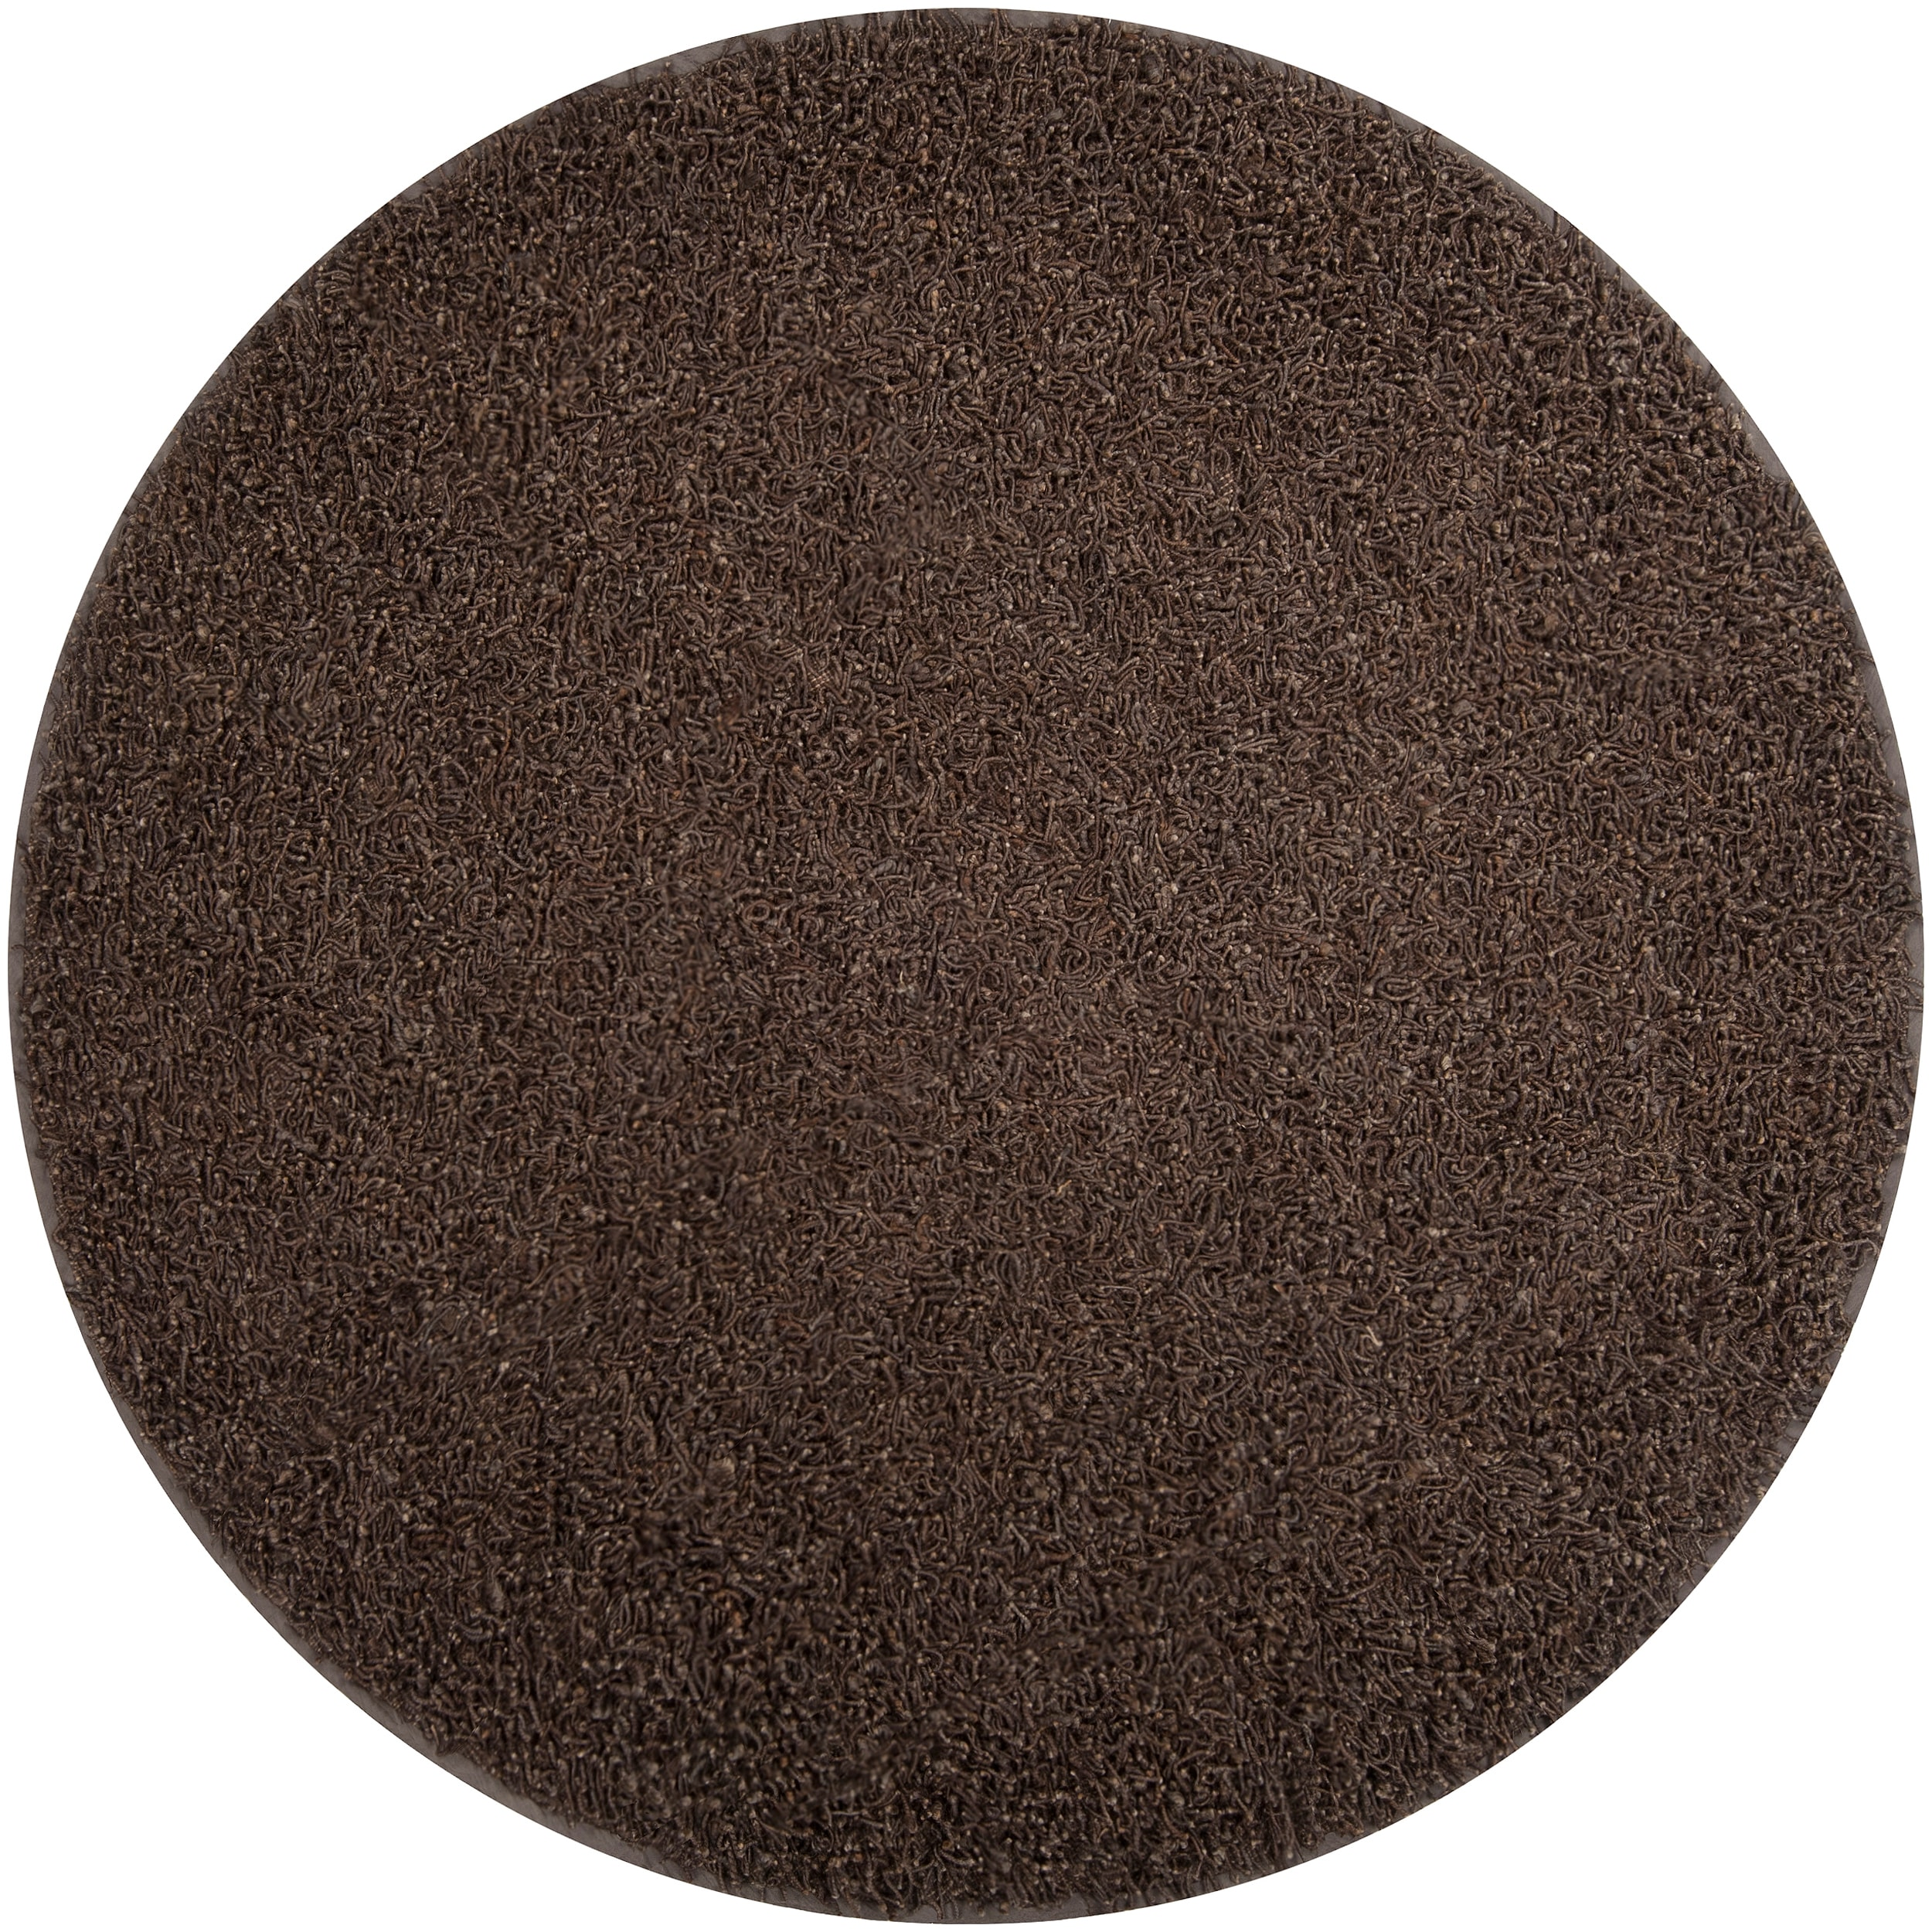 Hand-woven Brown Quintess Natural Fiber Jute Shag Rug (6' Round)